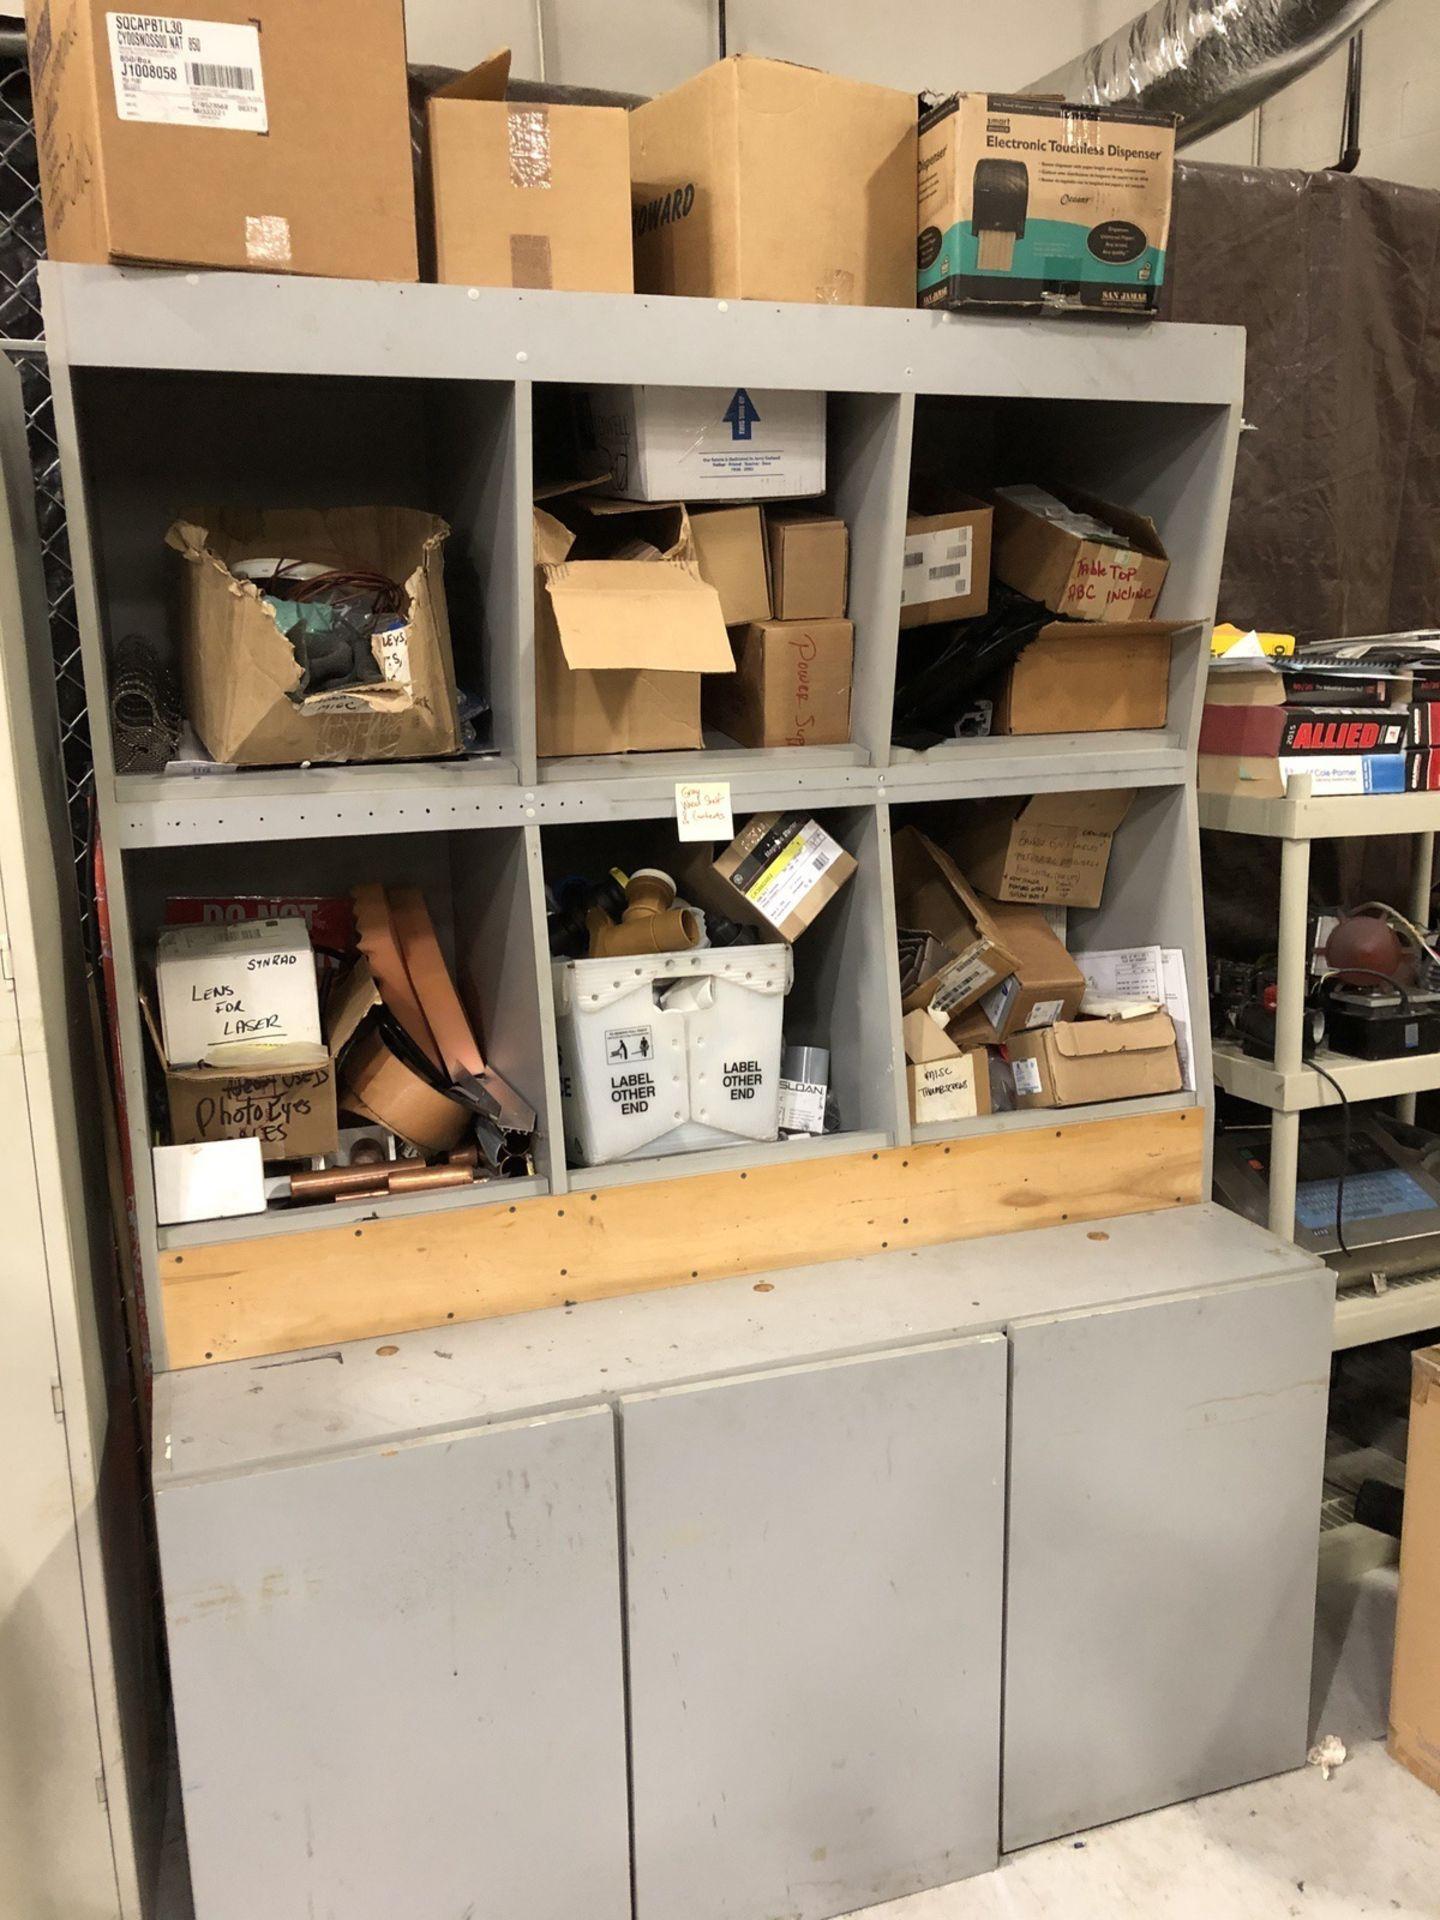 Lot 114 - 3-Door Wood Shelve With Contents - Grey   Rig Fee: $25 or Buyer Remove